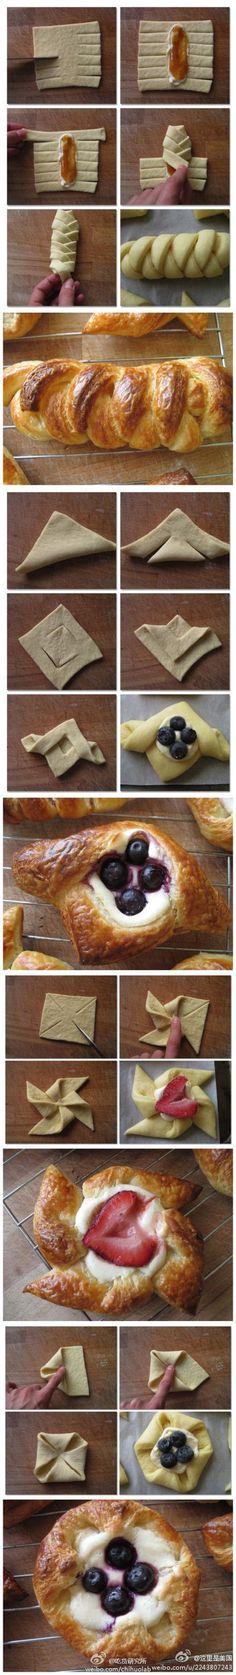 Pastry folding!